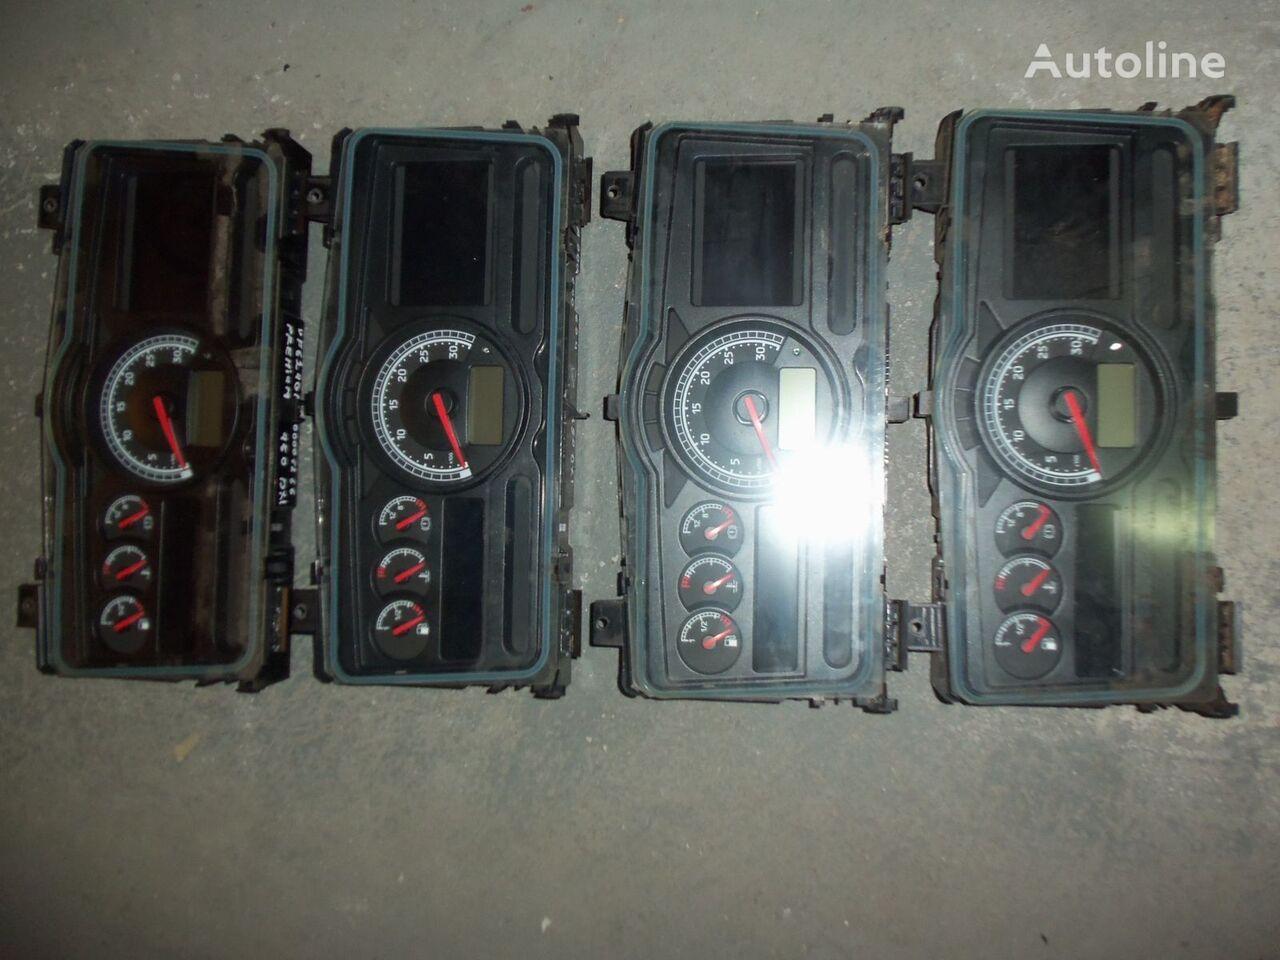 Renault Premium DXI instrument panel, dashboard, 7420771818 panou cu dispozitive pentru RENAULT Premium DXI autotractor